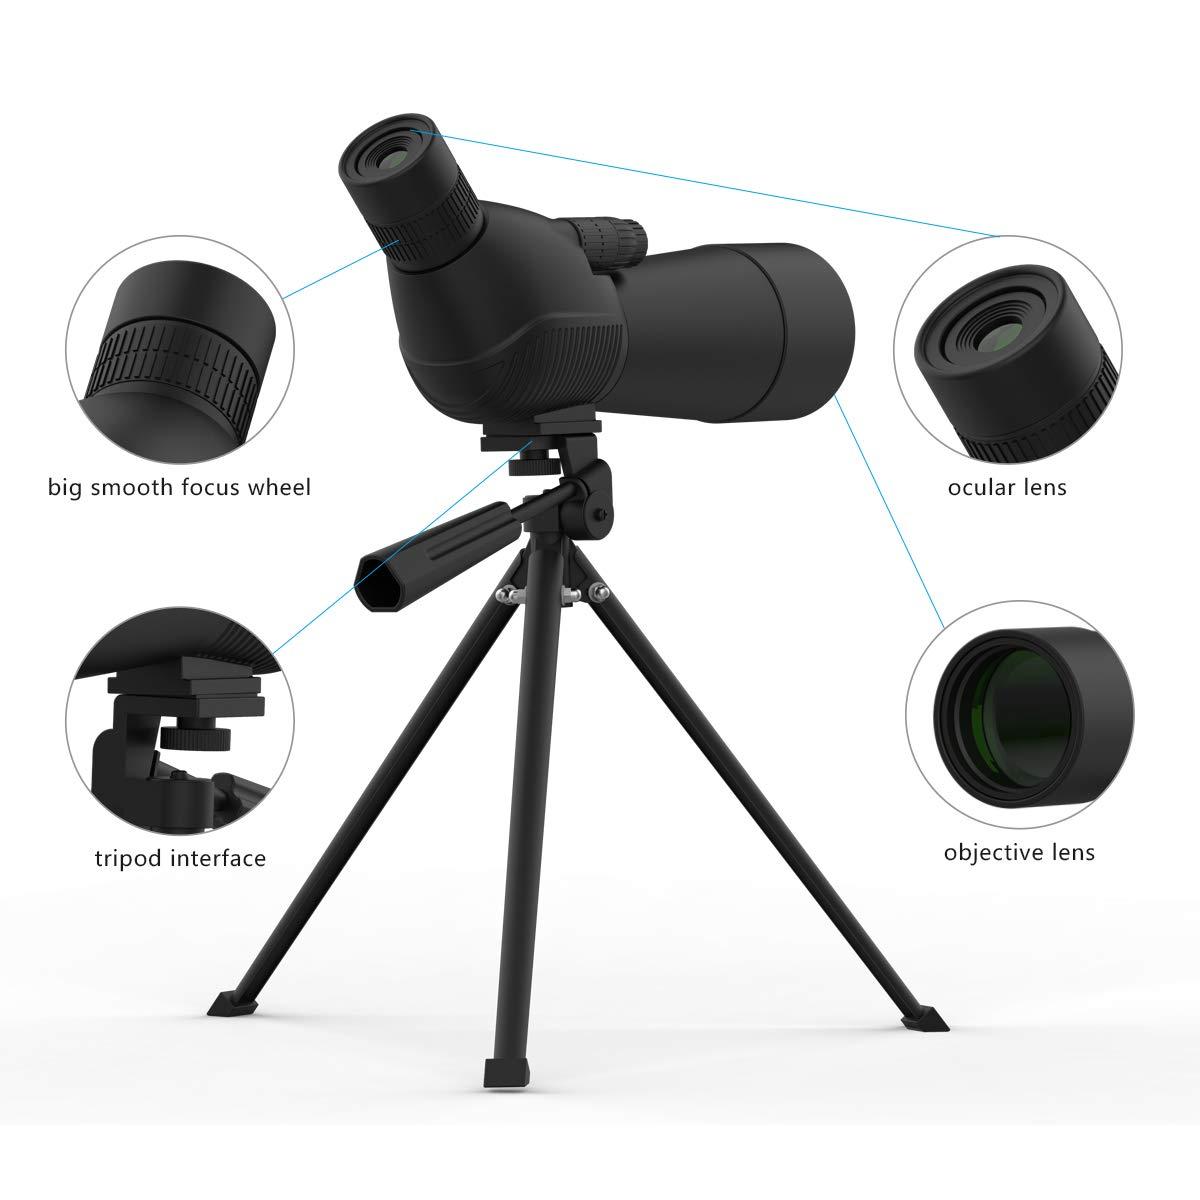 MIAO 15-45x60 Monocular Telescope, Compact Binoculars Single-Tube Zoom Telescope Binoculars with Smartphone Tripod and Mount Adapter for Target Shooting, Birdwatching, Wildlife Scenery